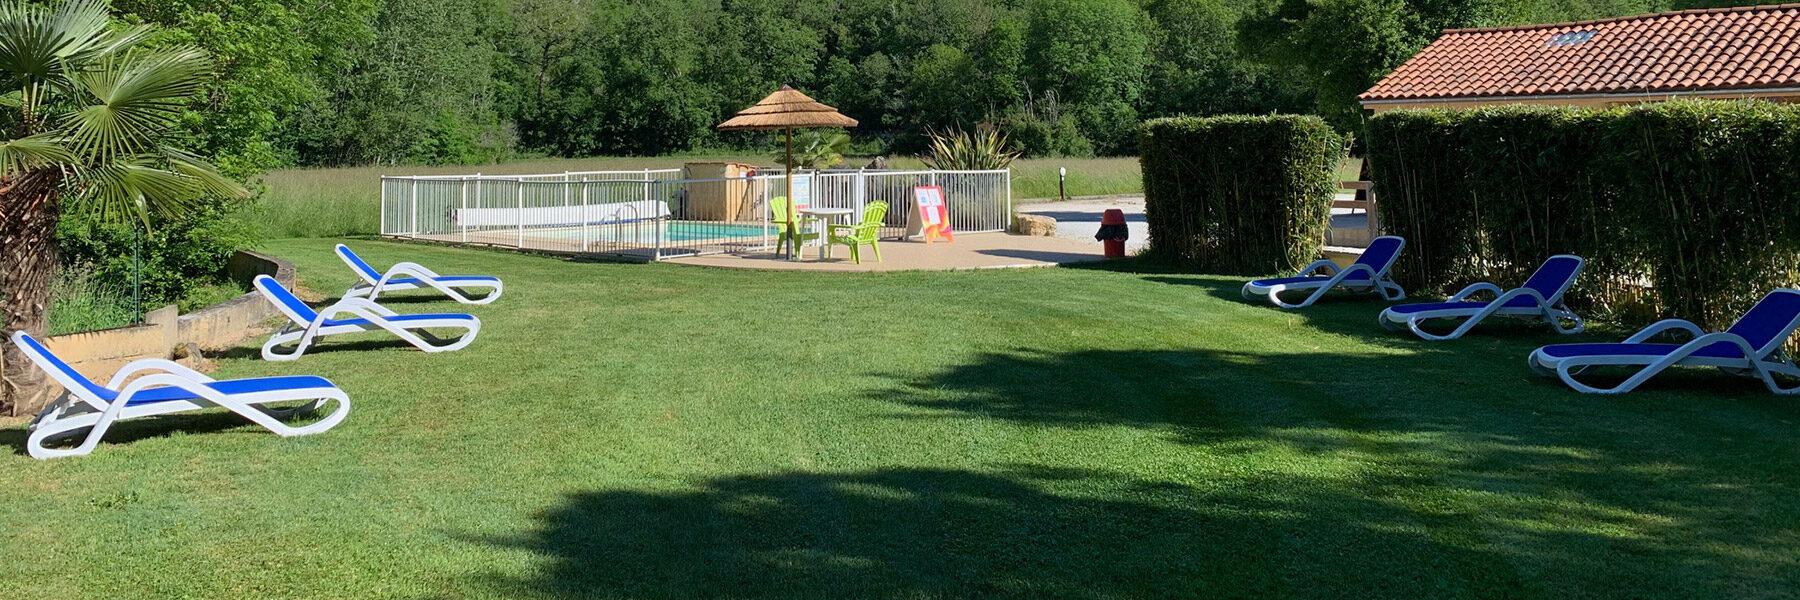 Camping en Périgord avec piscines chauffées